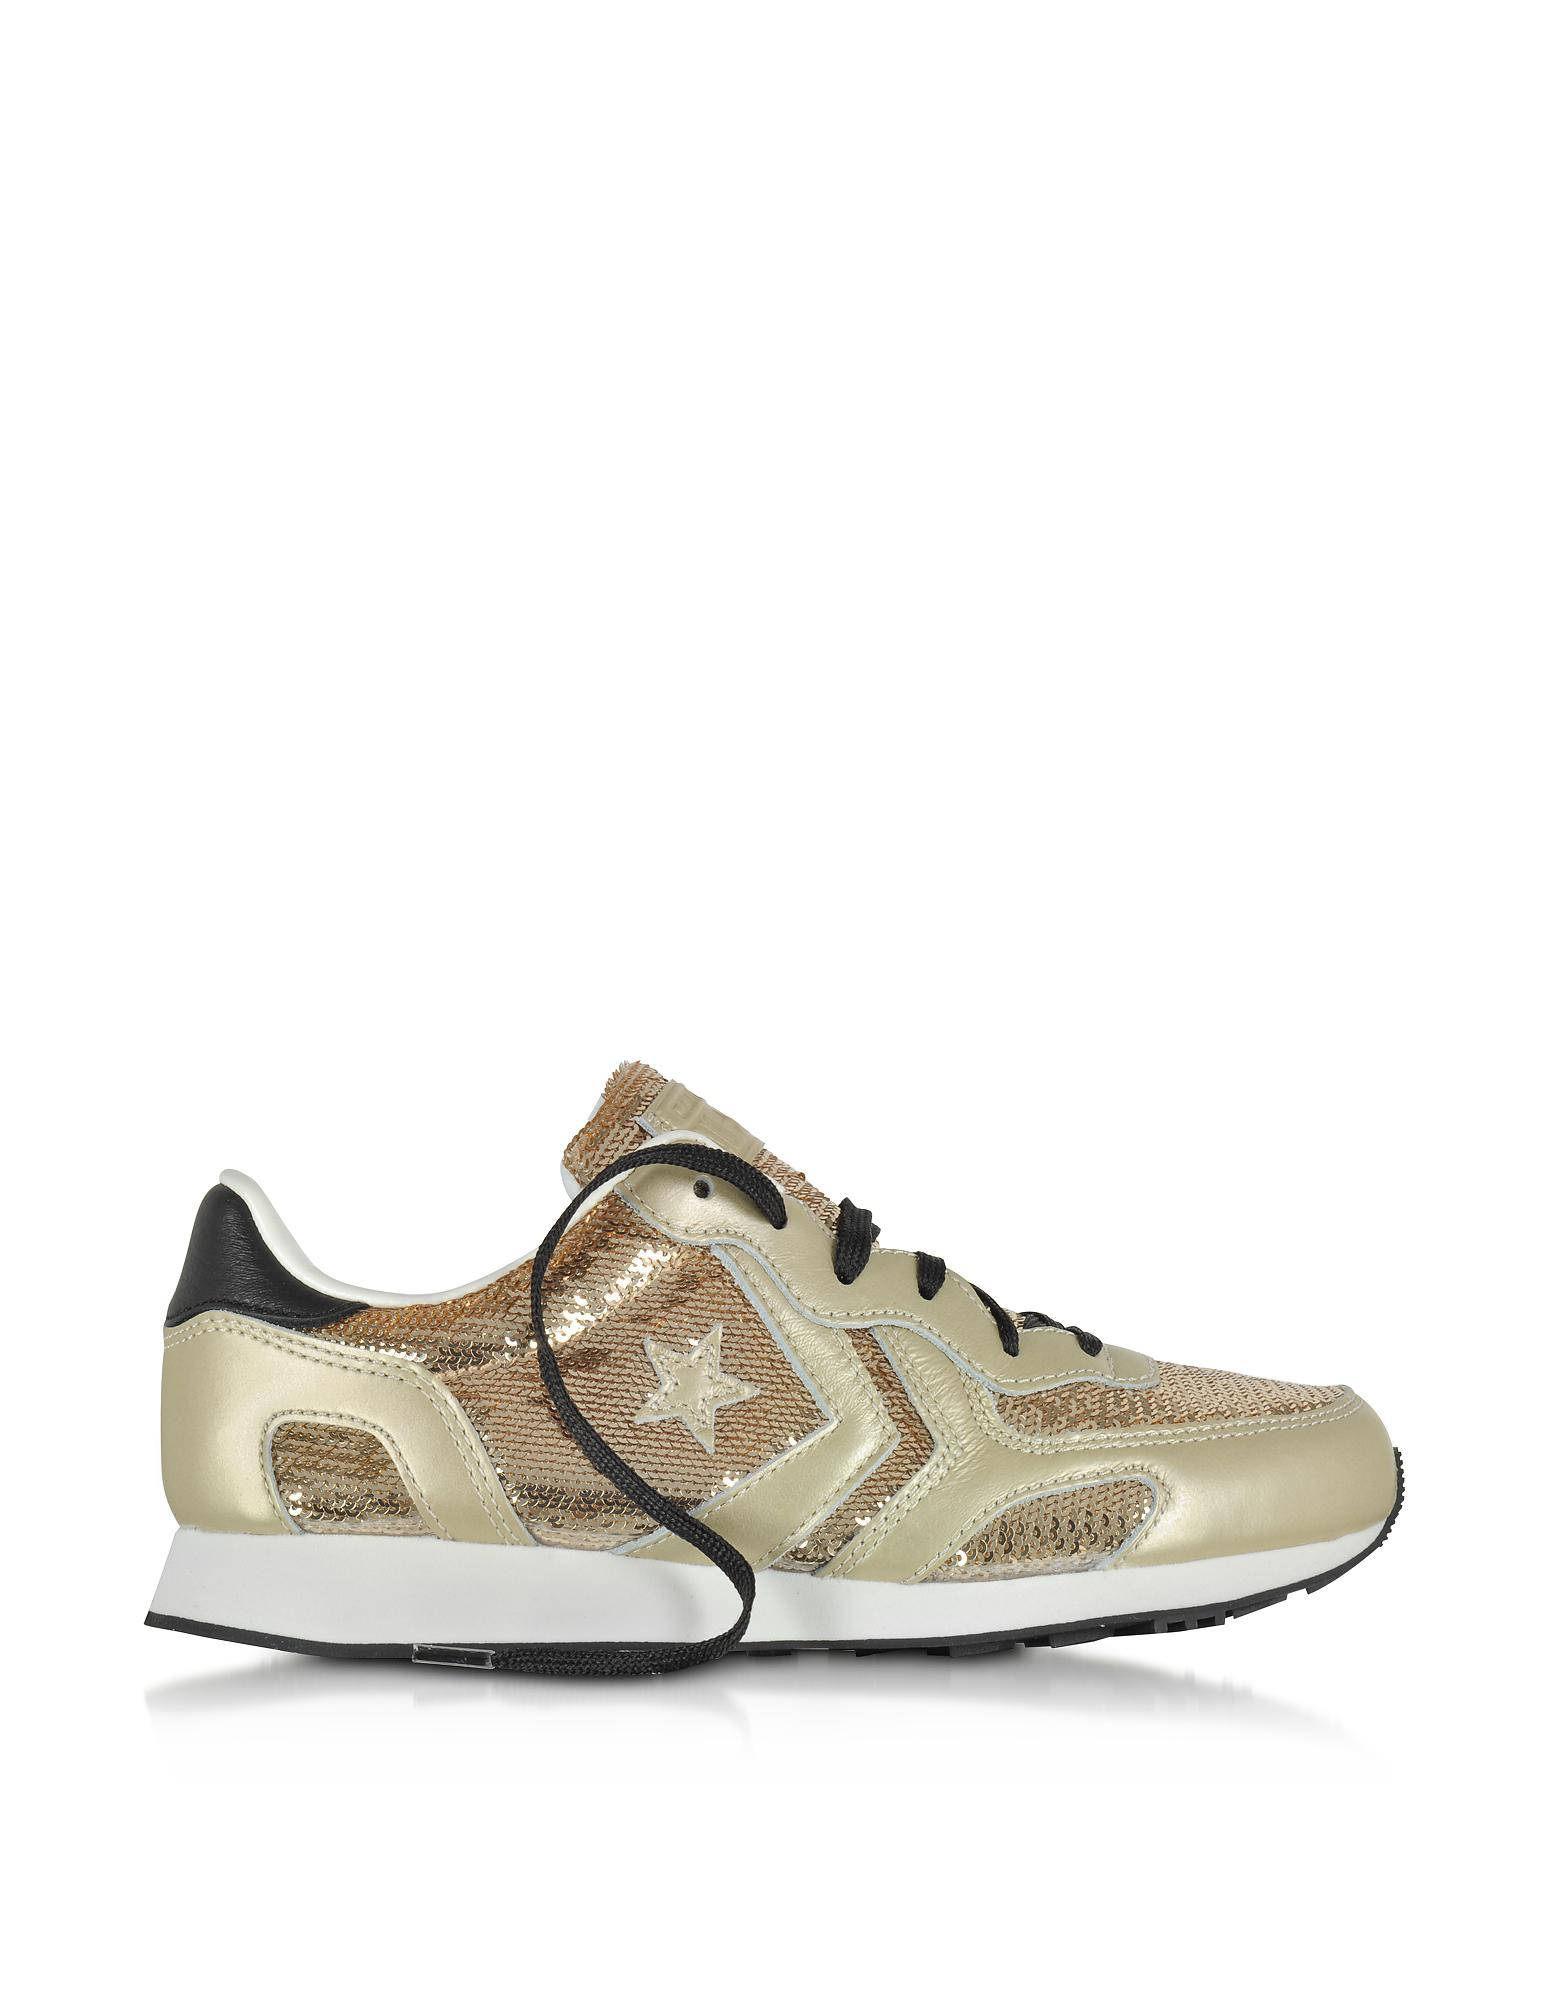 AUCKLAND RACER OX SEQUINS/LEATHER METALLIC - FOOTWEAR - Low-tops & sneakers Converse gh00xbAK